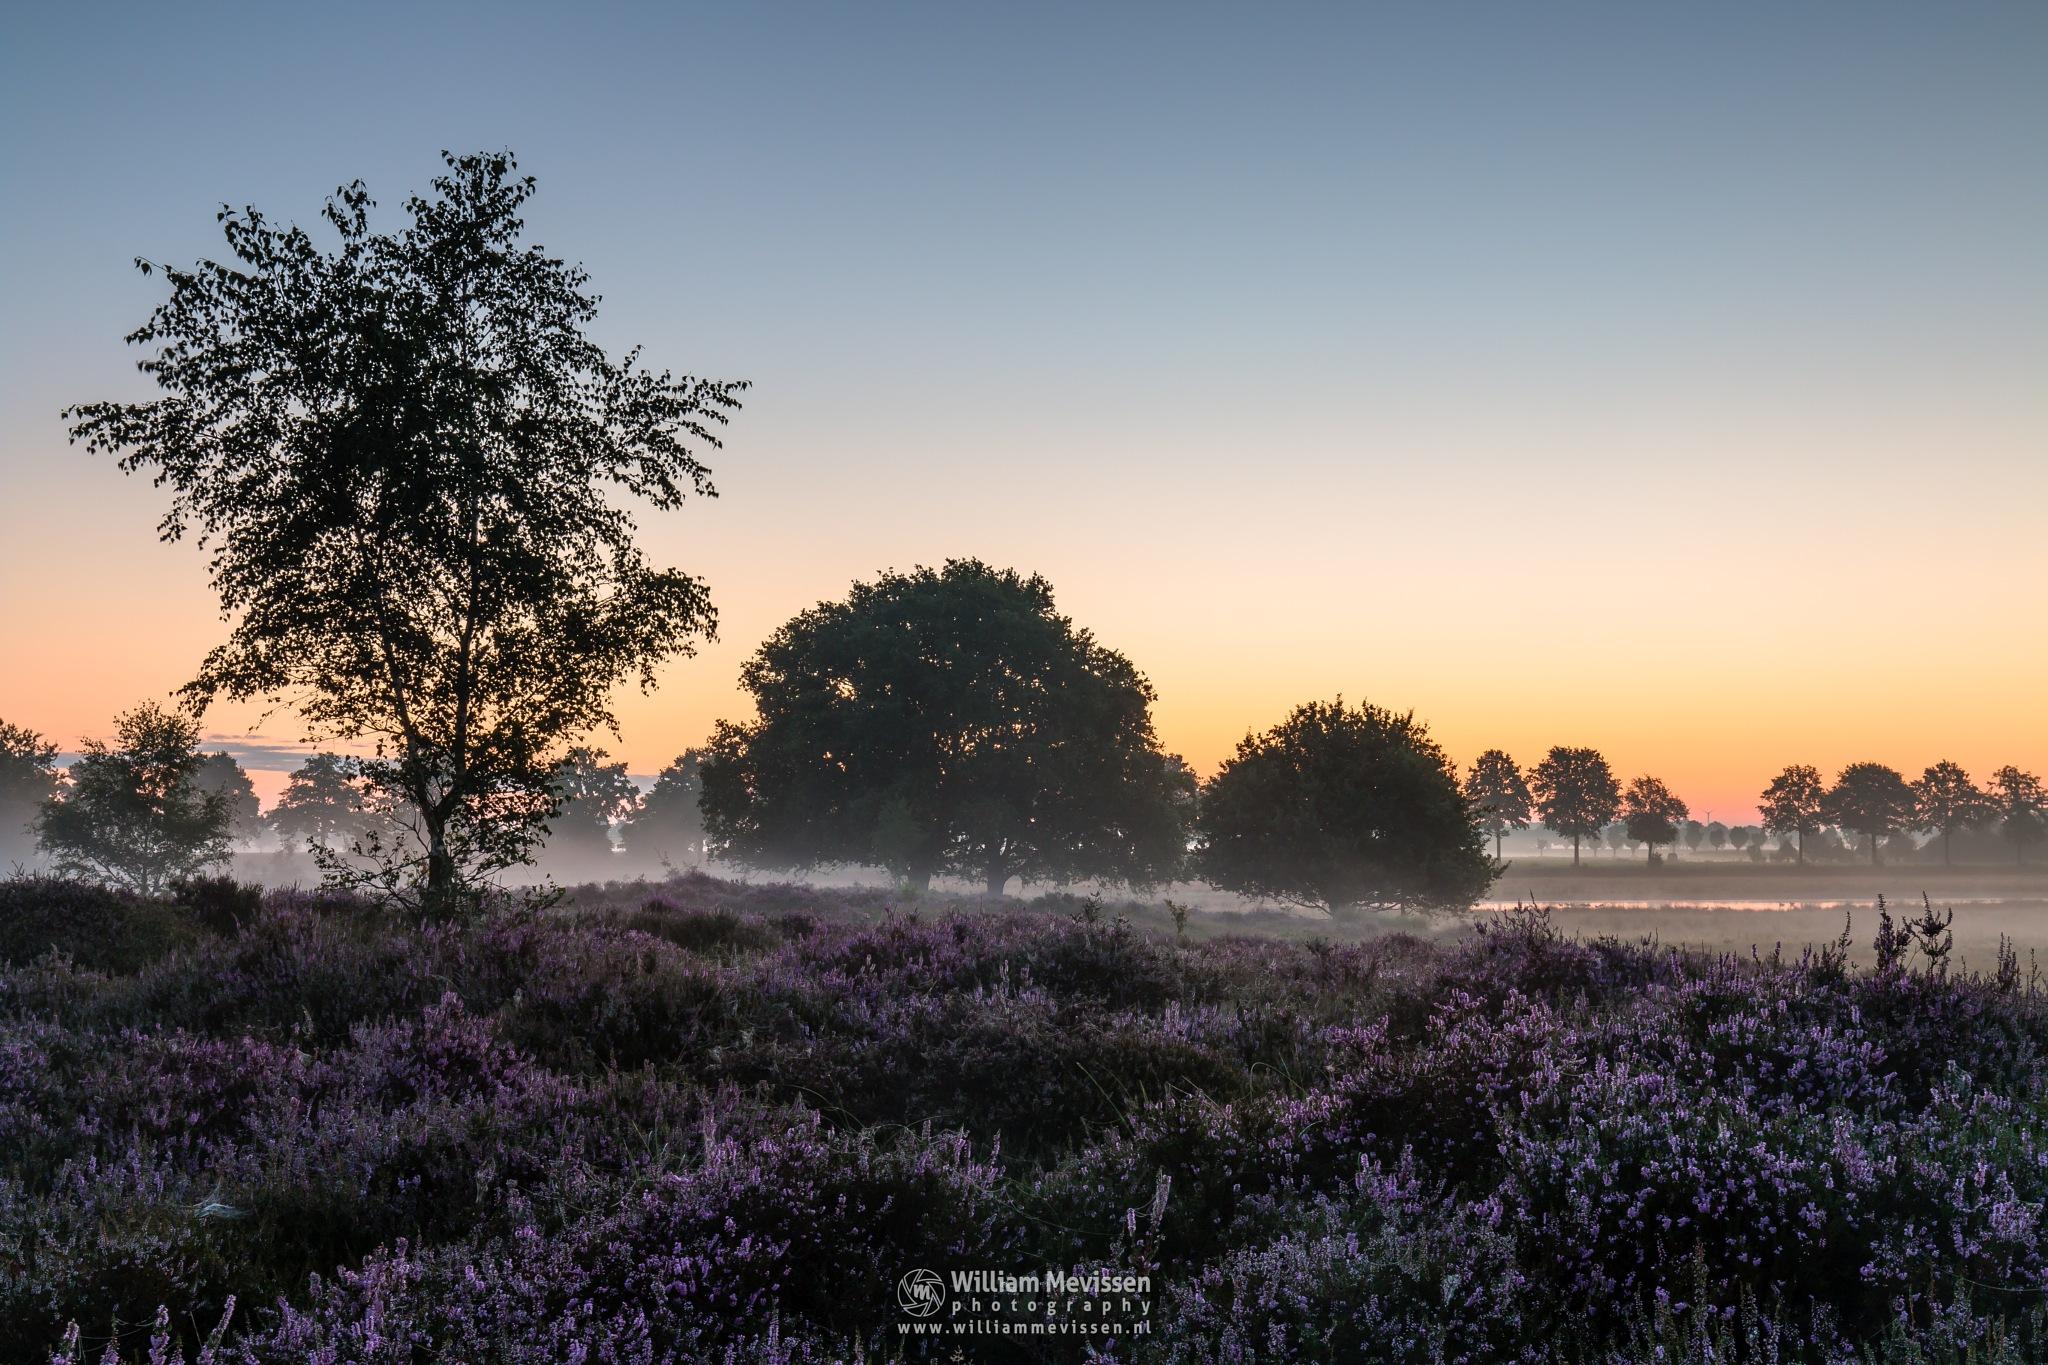 Misty Heather Sunrise by William Mevissen